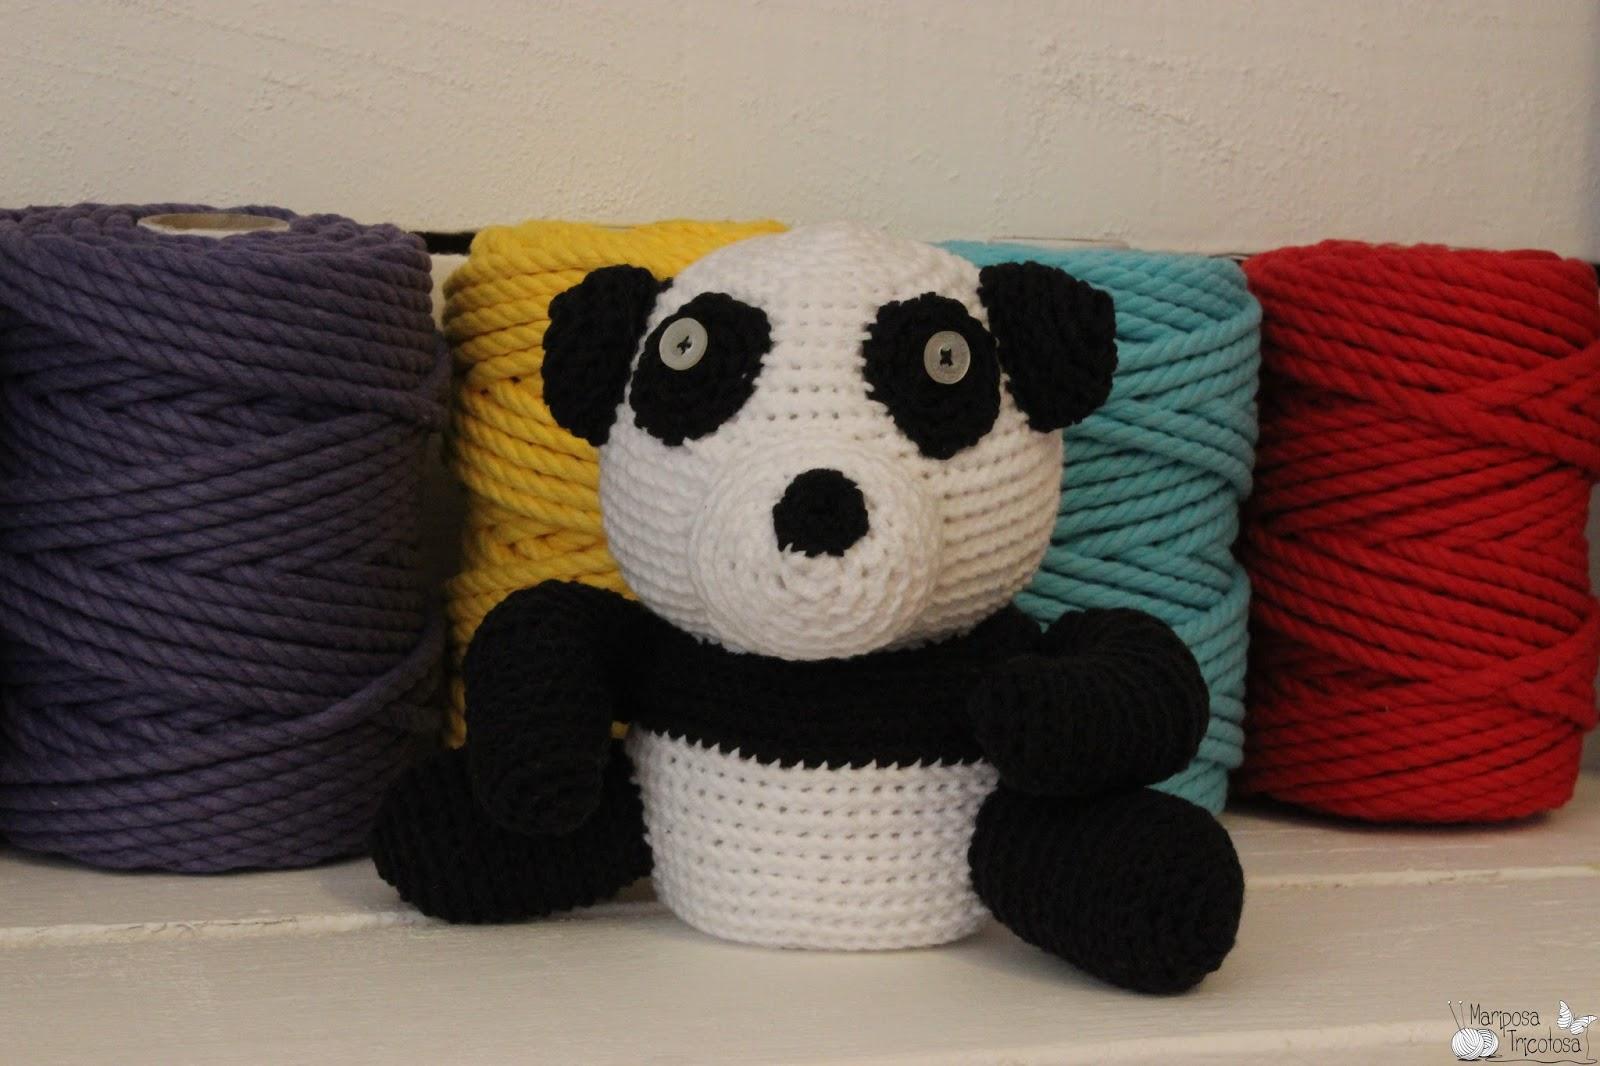 Amigurumi De Panda : mariposa tricotosa: Amigurumi panda-cumpleanero